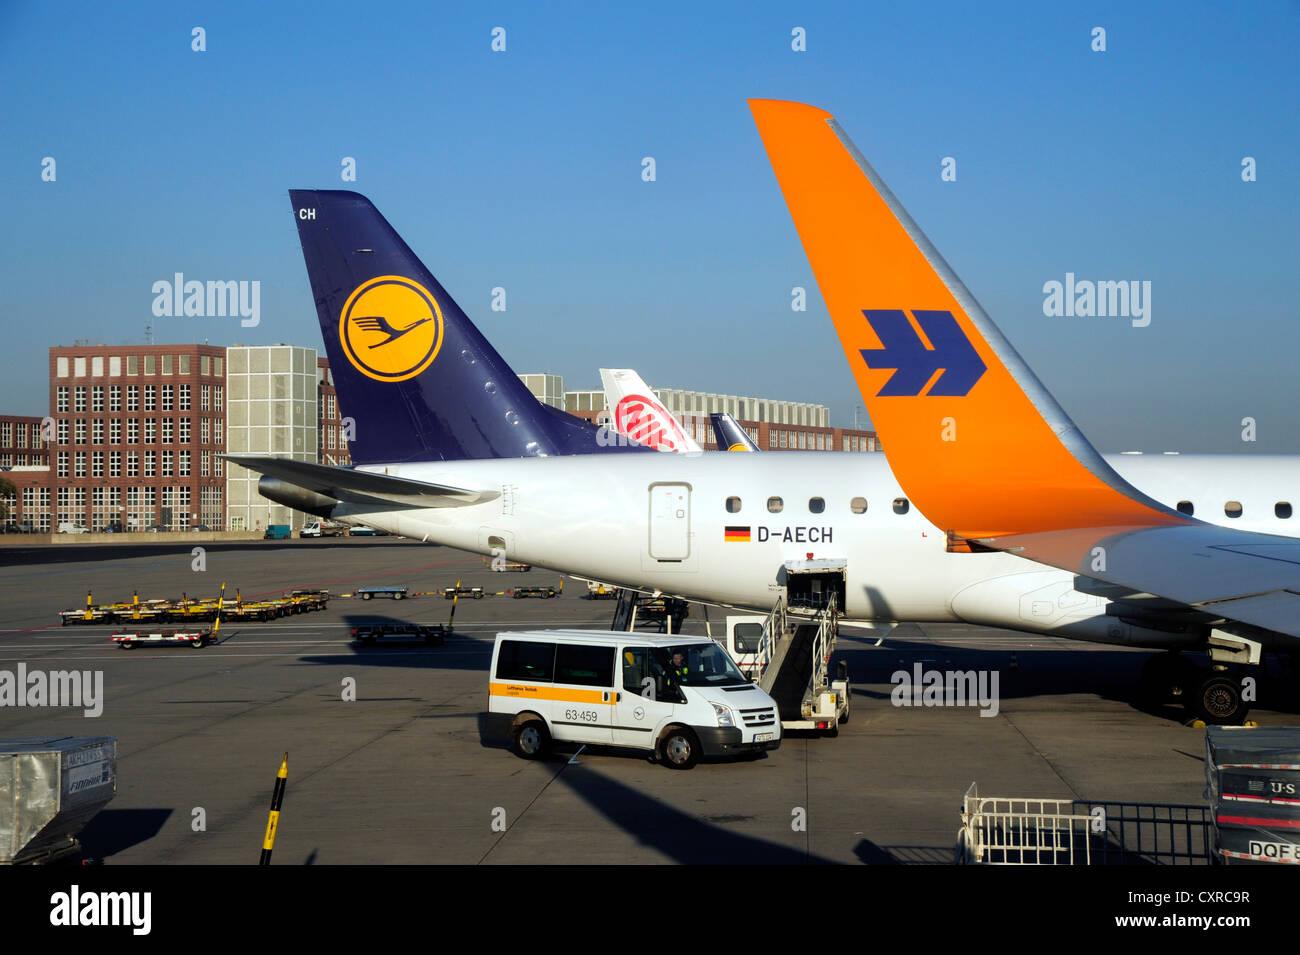 Airplanes at Frankfurt Airport, Frankfurt am Main, Hesse, Germany, Europe - Stock Image